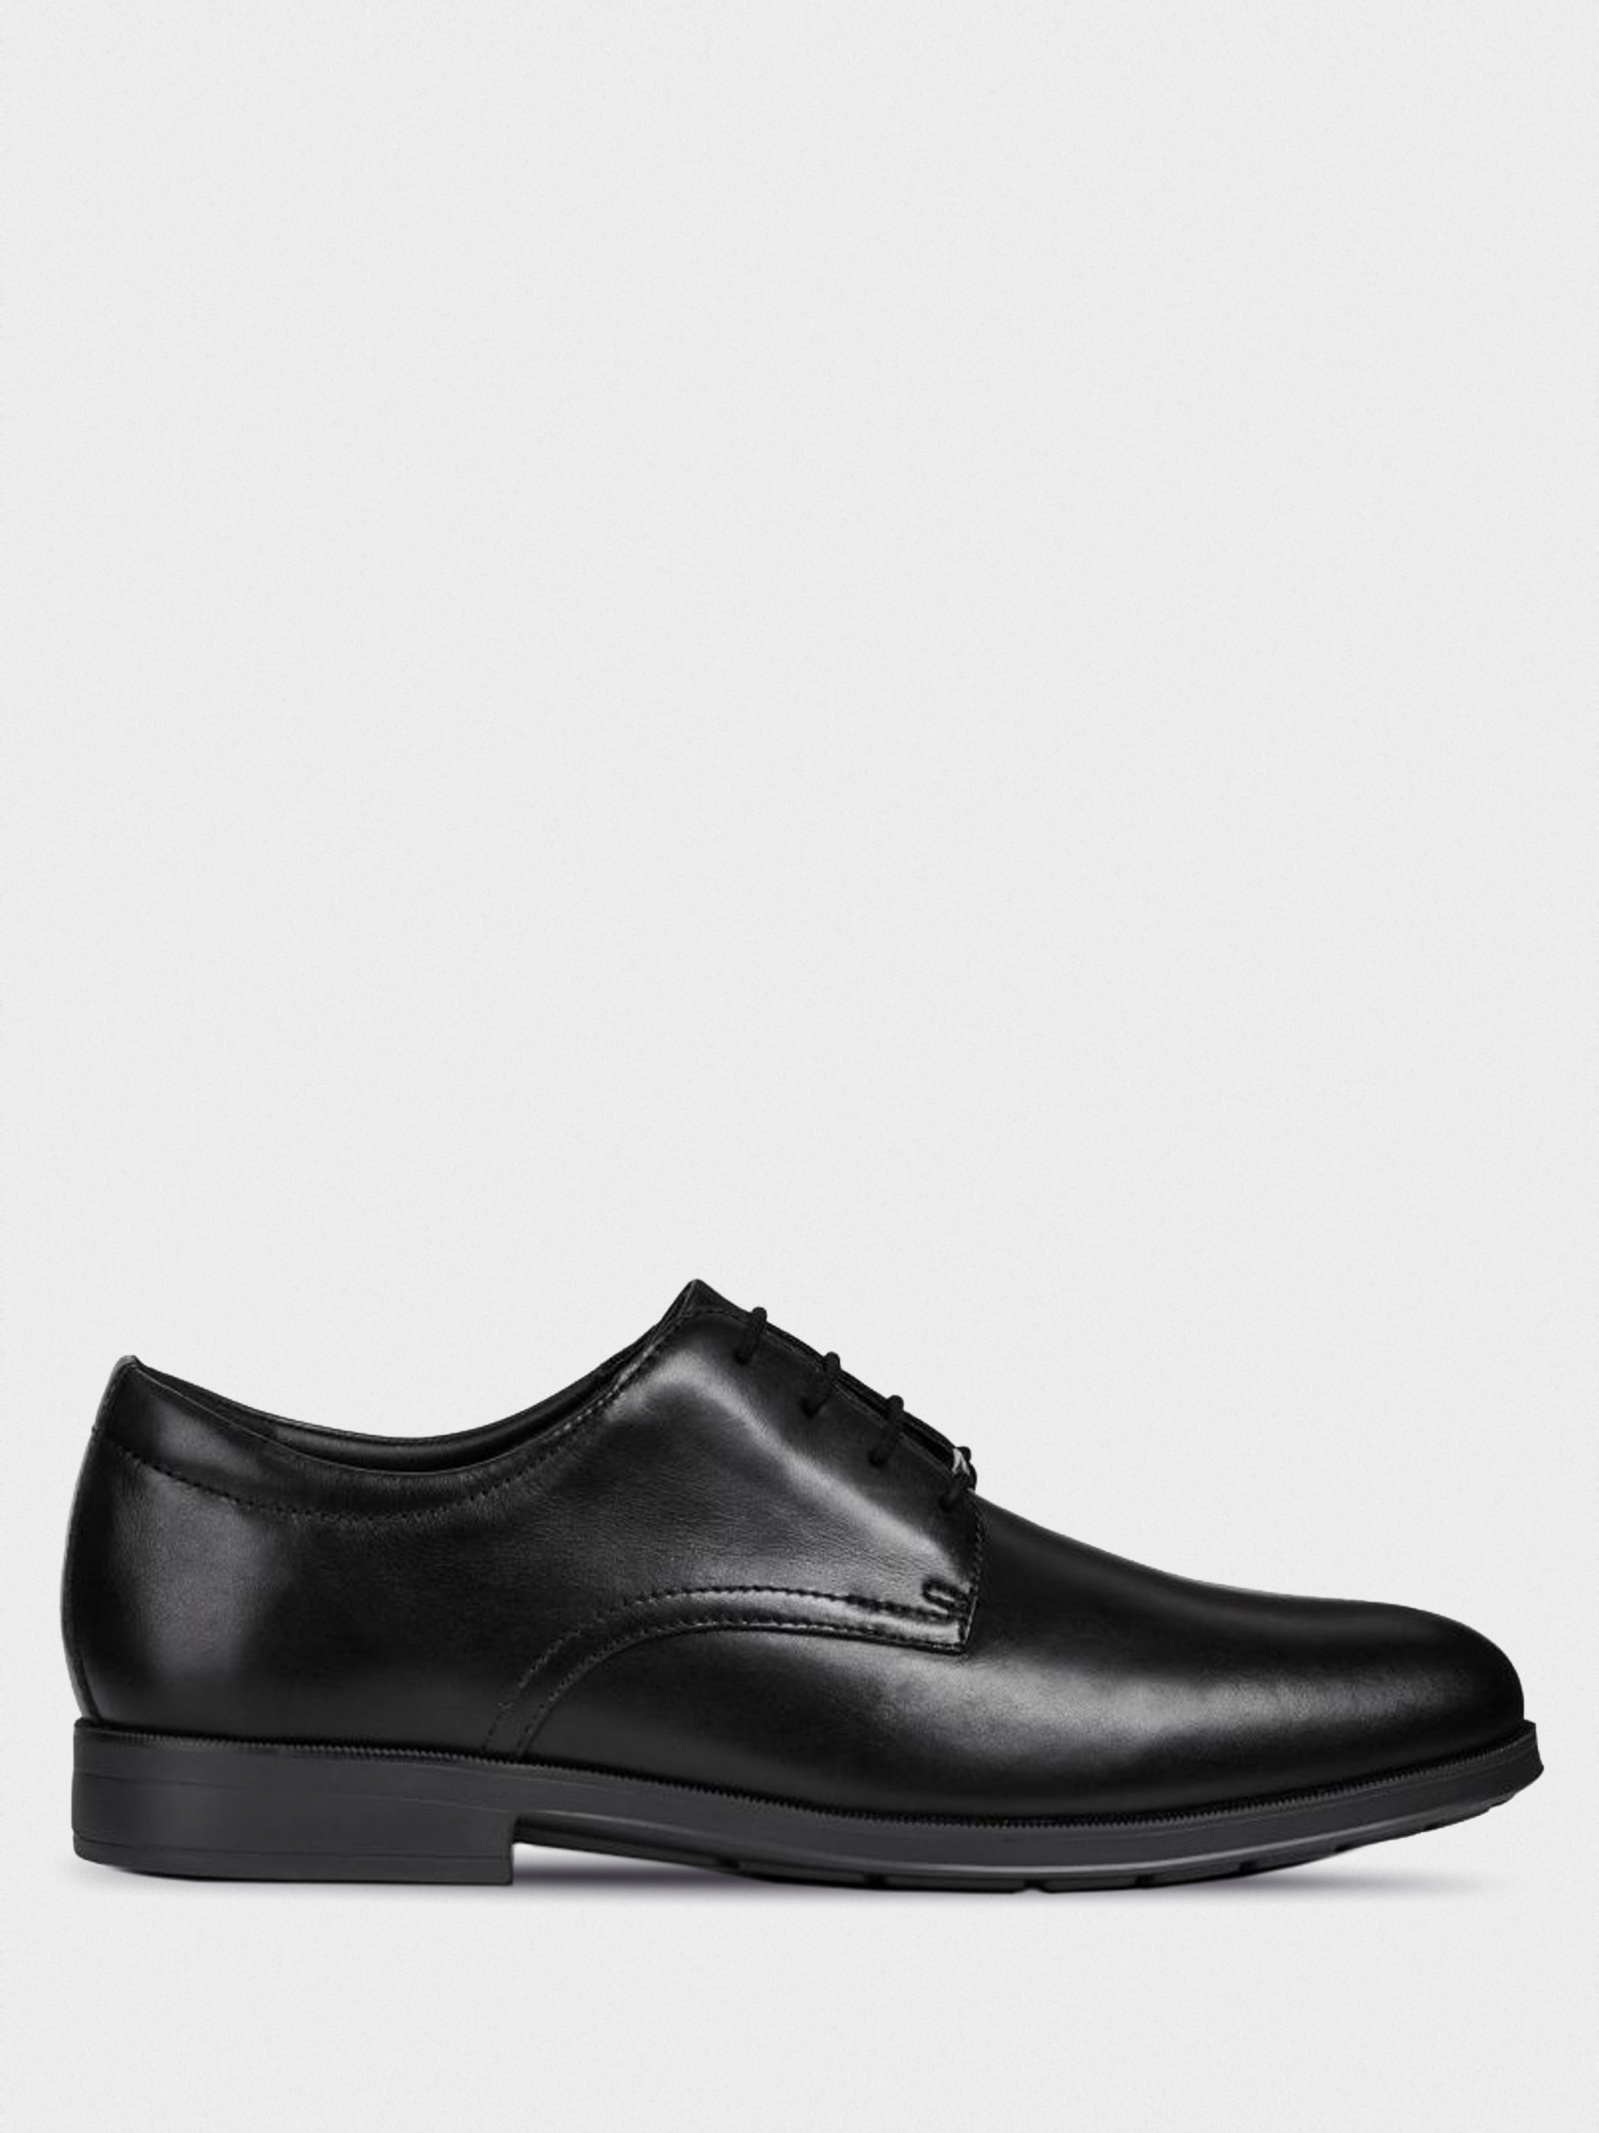 Туфли для мужчин Geox HILSTONE WIDE ABX XM1896 в Украине, 2017